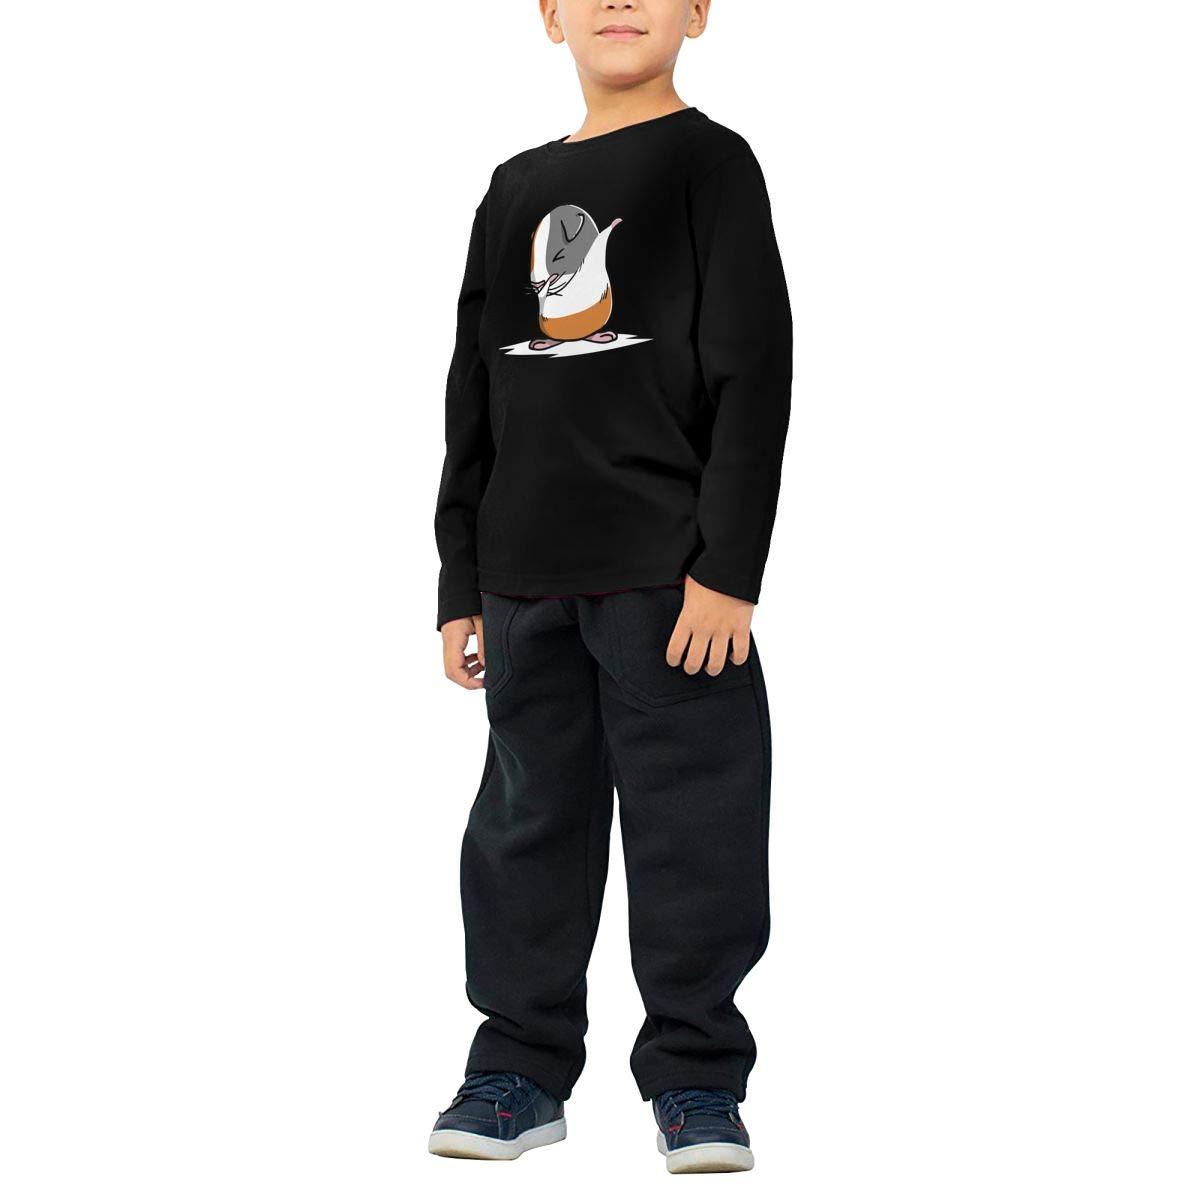 Toddler Childrens Dabbing Guinea Pig Printed Long Sleeve 100/% Cotton Infants Tee Shirt